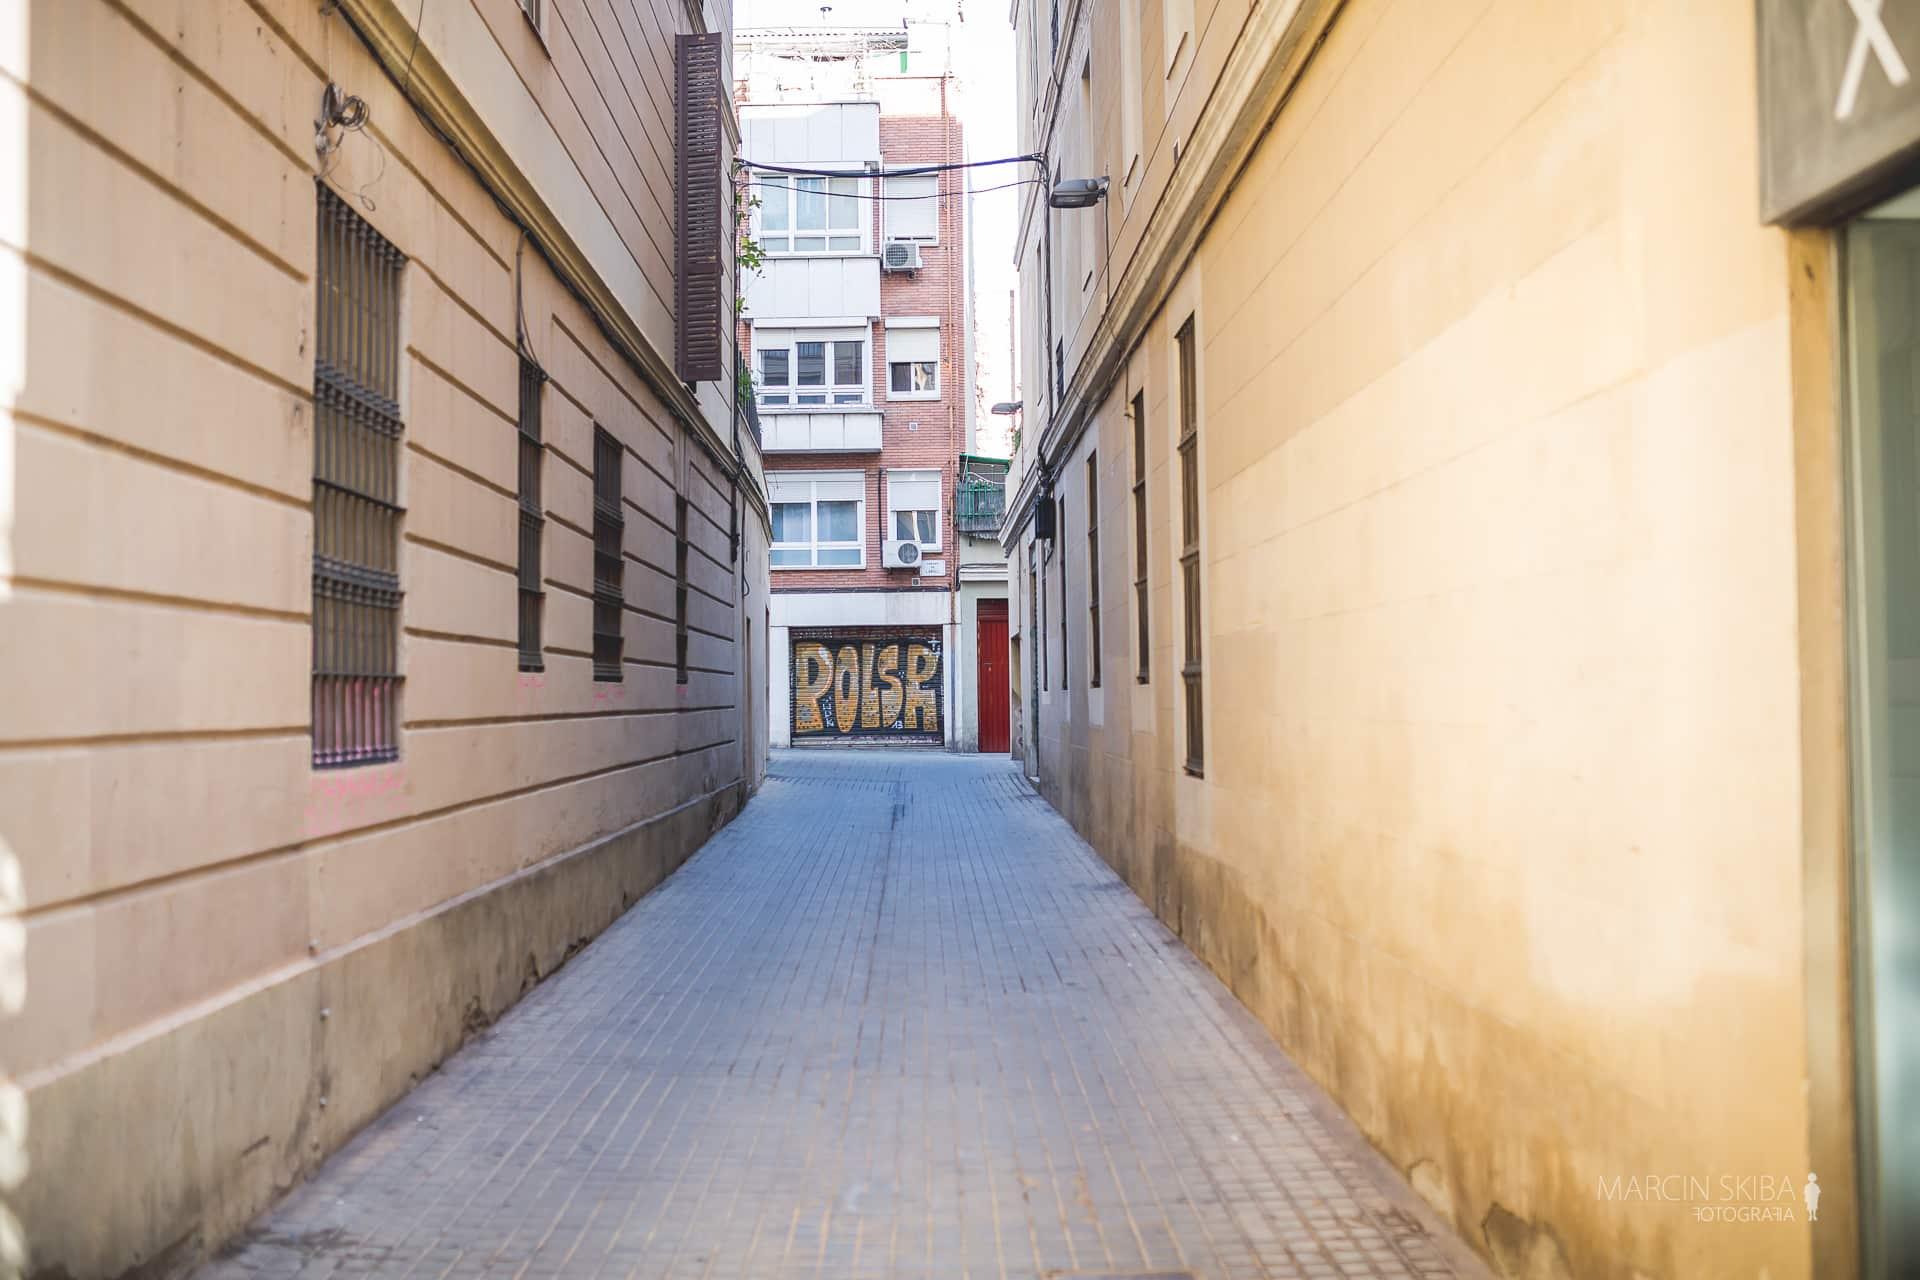 Barcelona streets and doors (2)